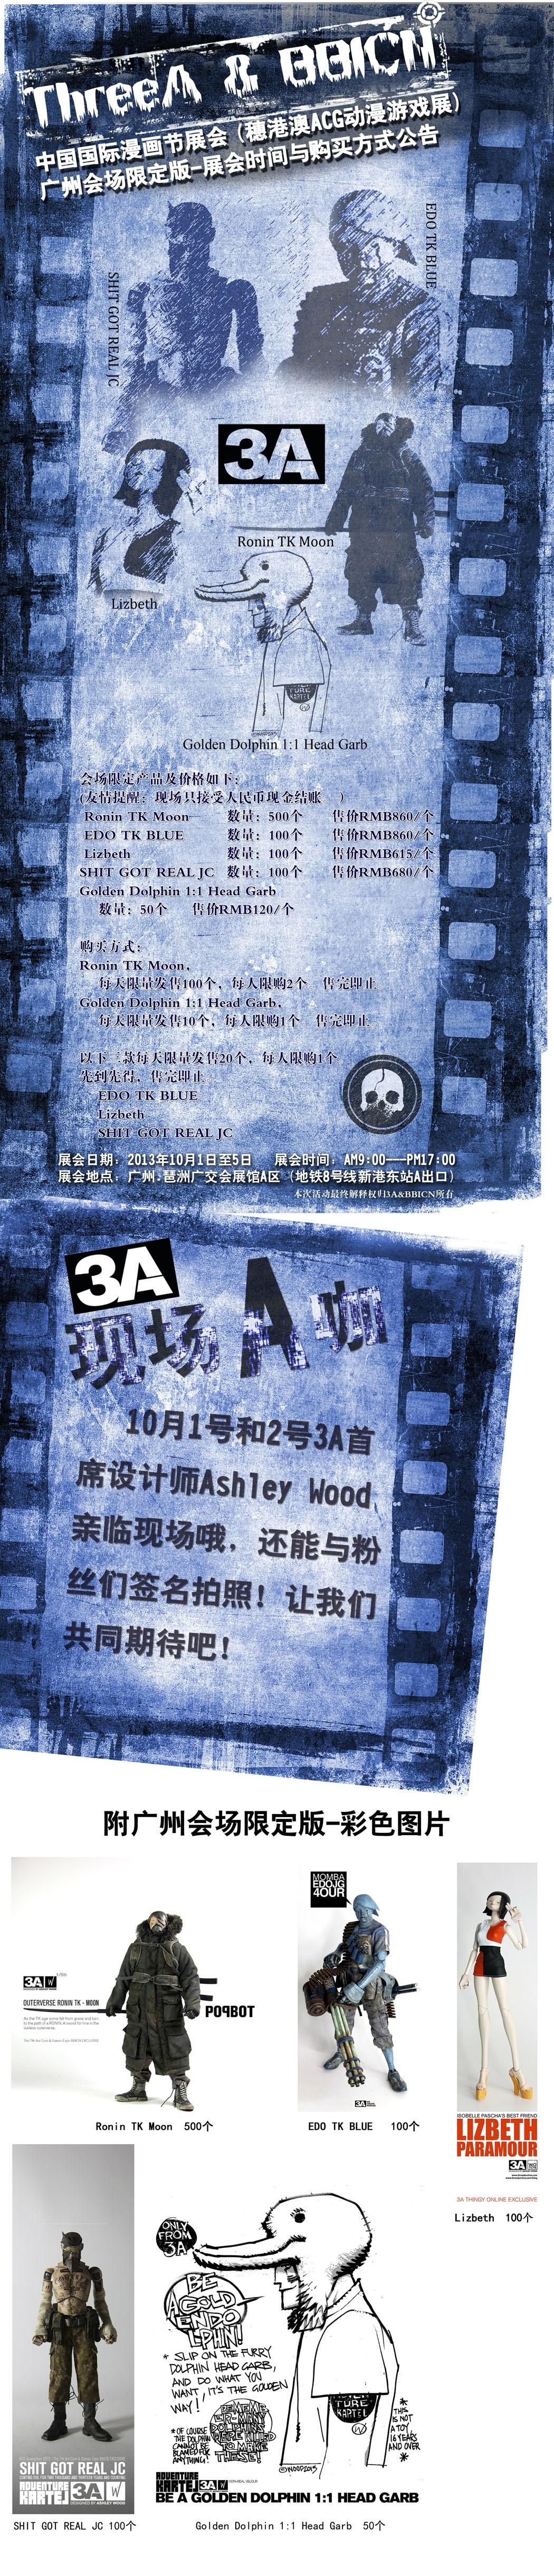 threeA 中國國際漫畫節展會 (穗港澳ACG動漫遊戲展) 廣州會場限定版 販售資訊